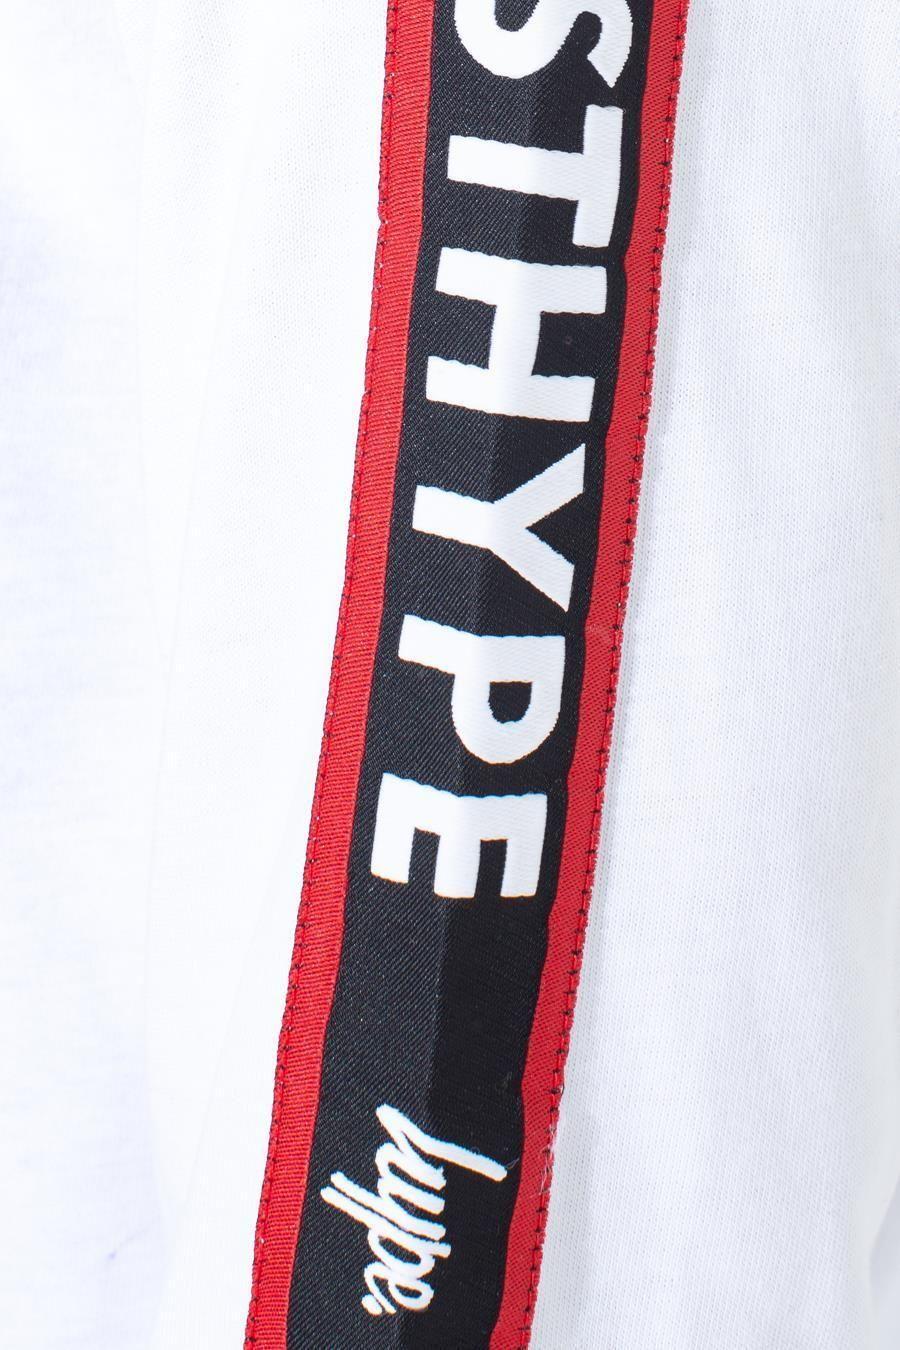 Hype Jh Race Tape Kids L/S T-Shirt 13Y